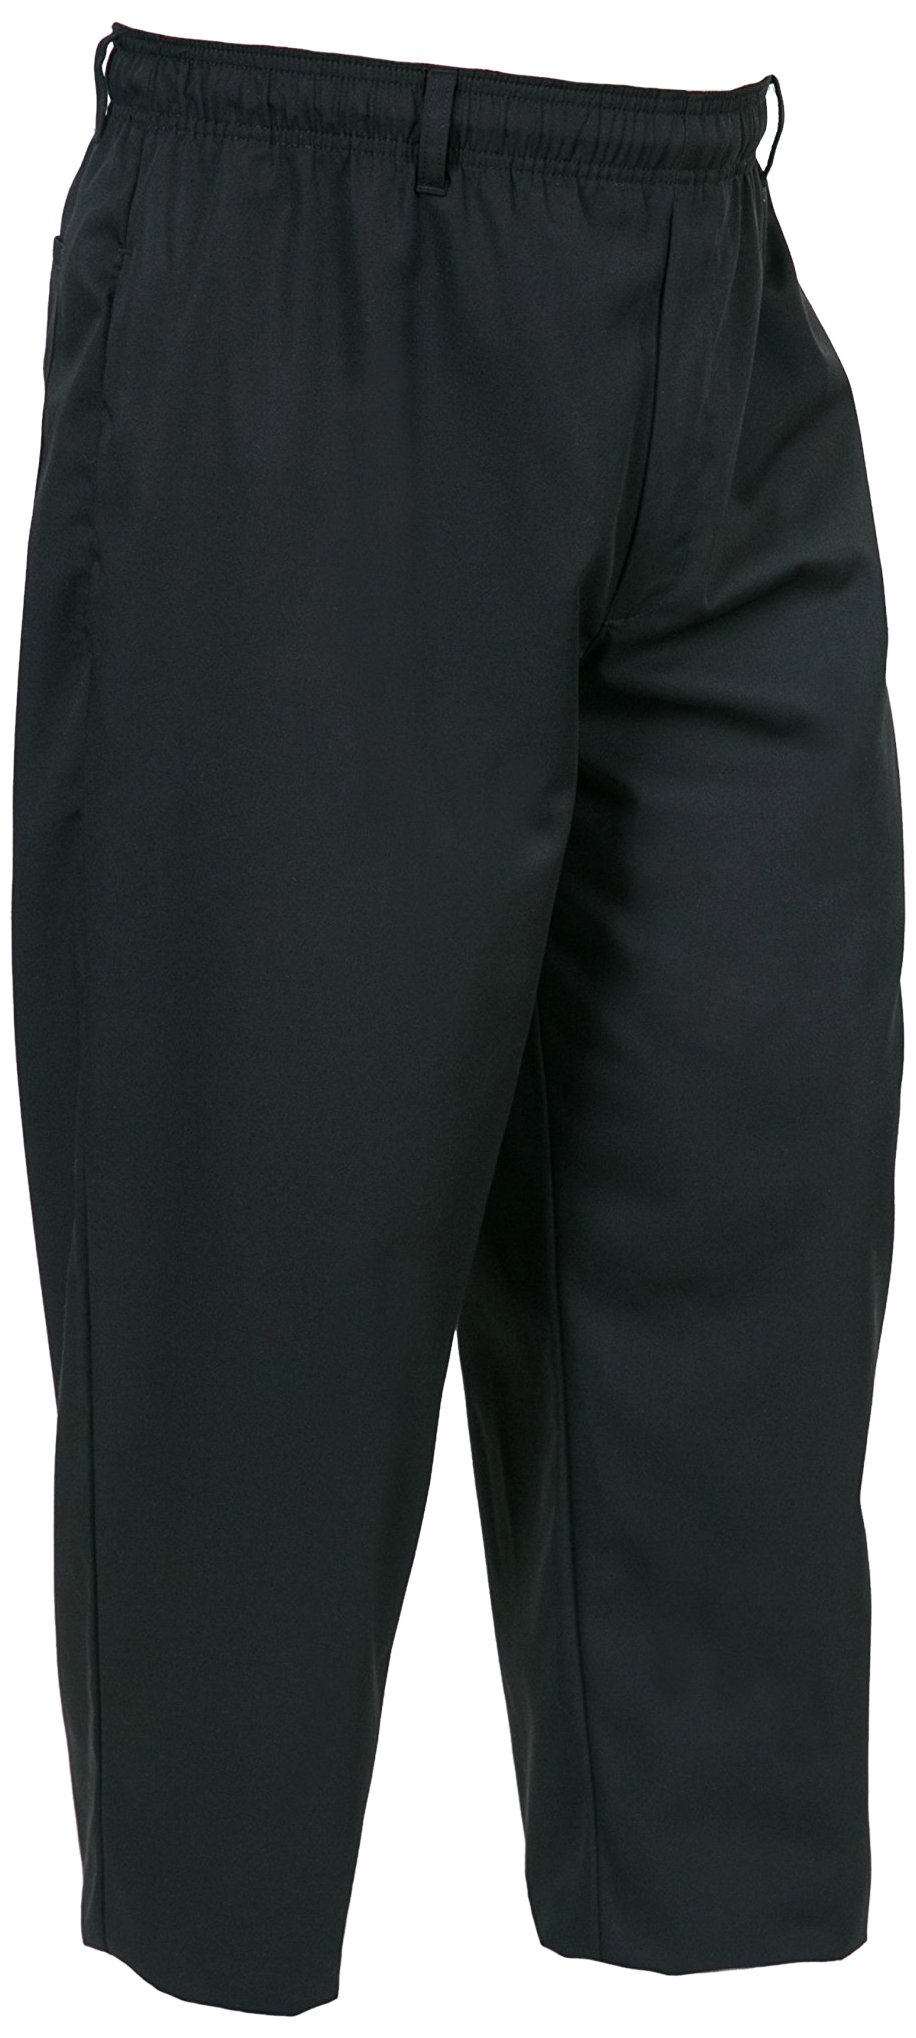 Mercer Culinary M60050BK4X Millennia Men's Cook Pants, 4X-Large, Black by Mercer Culinary